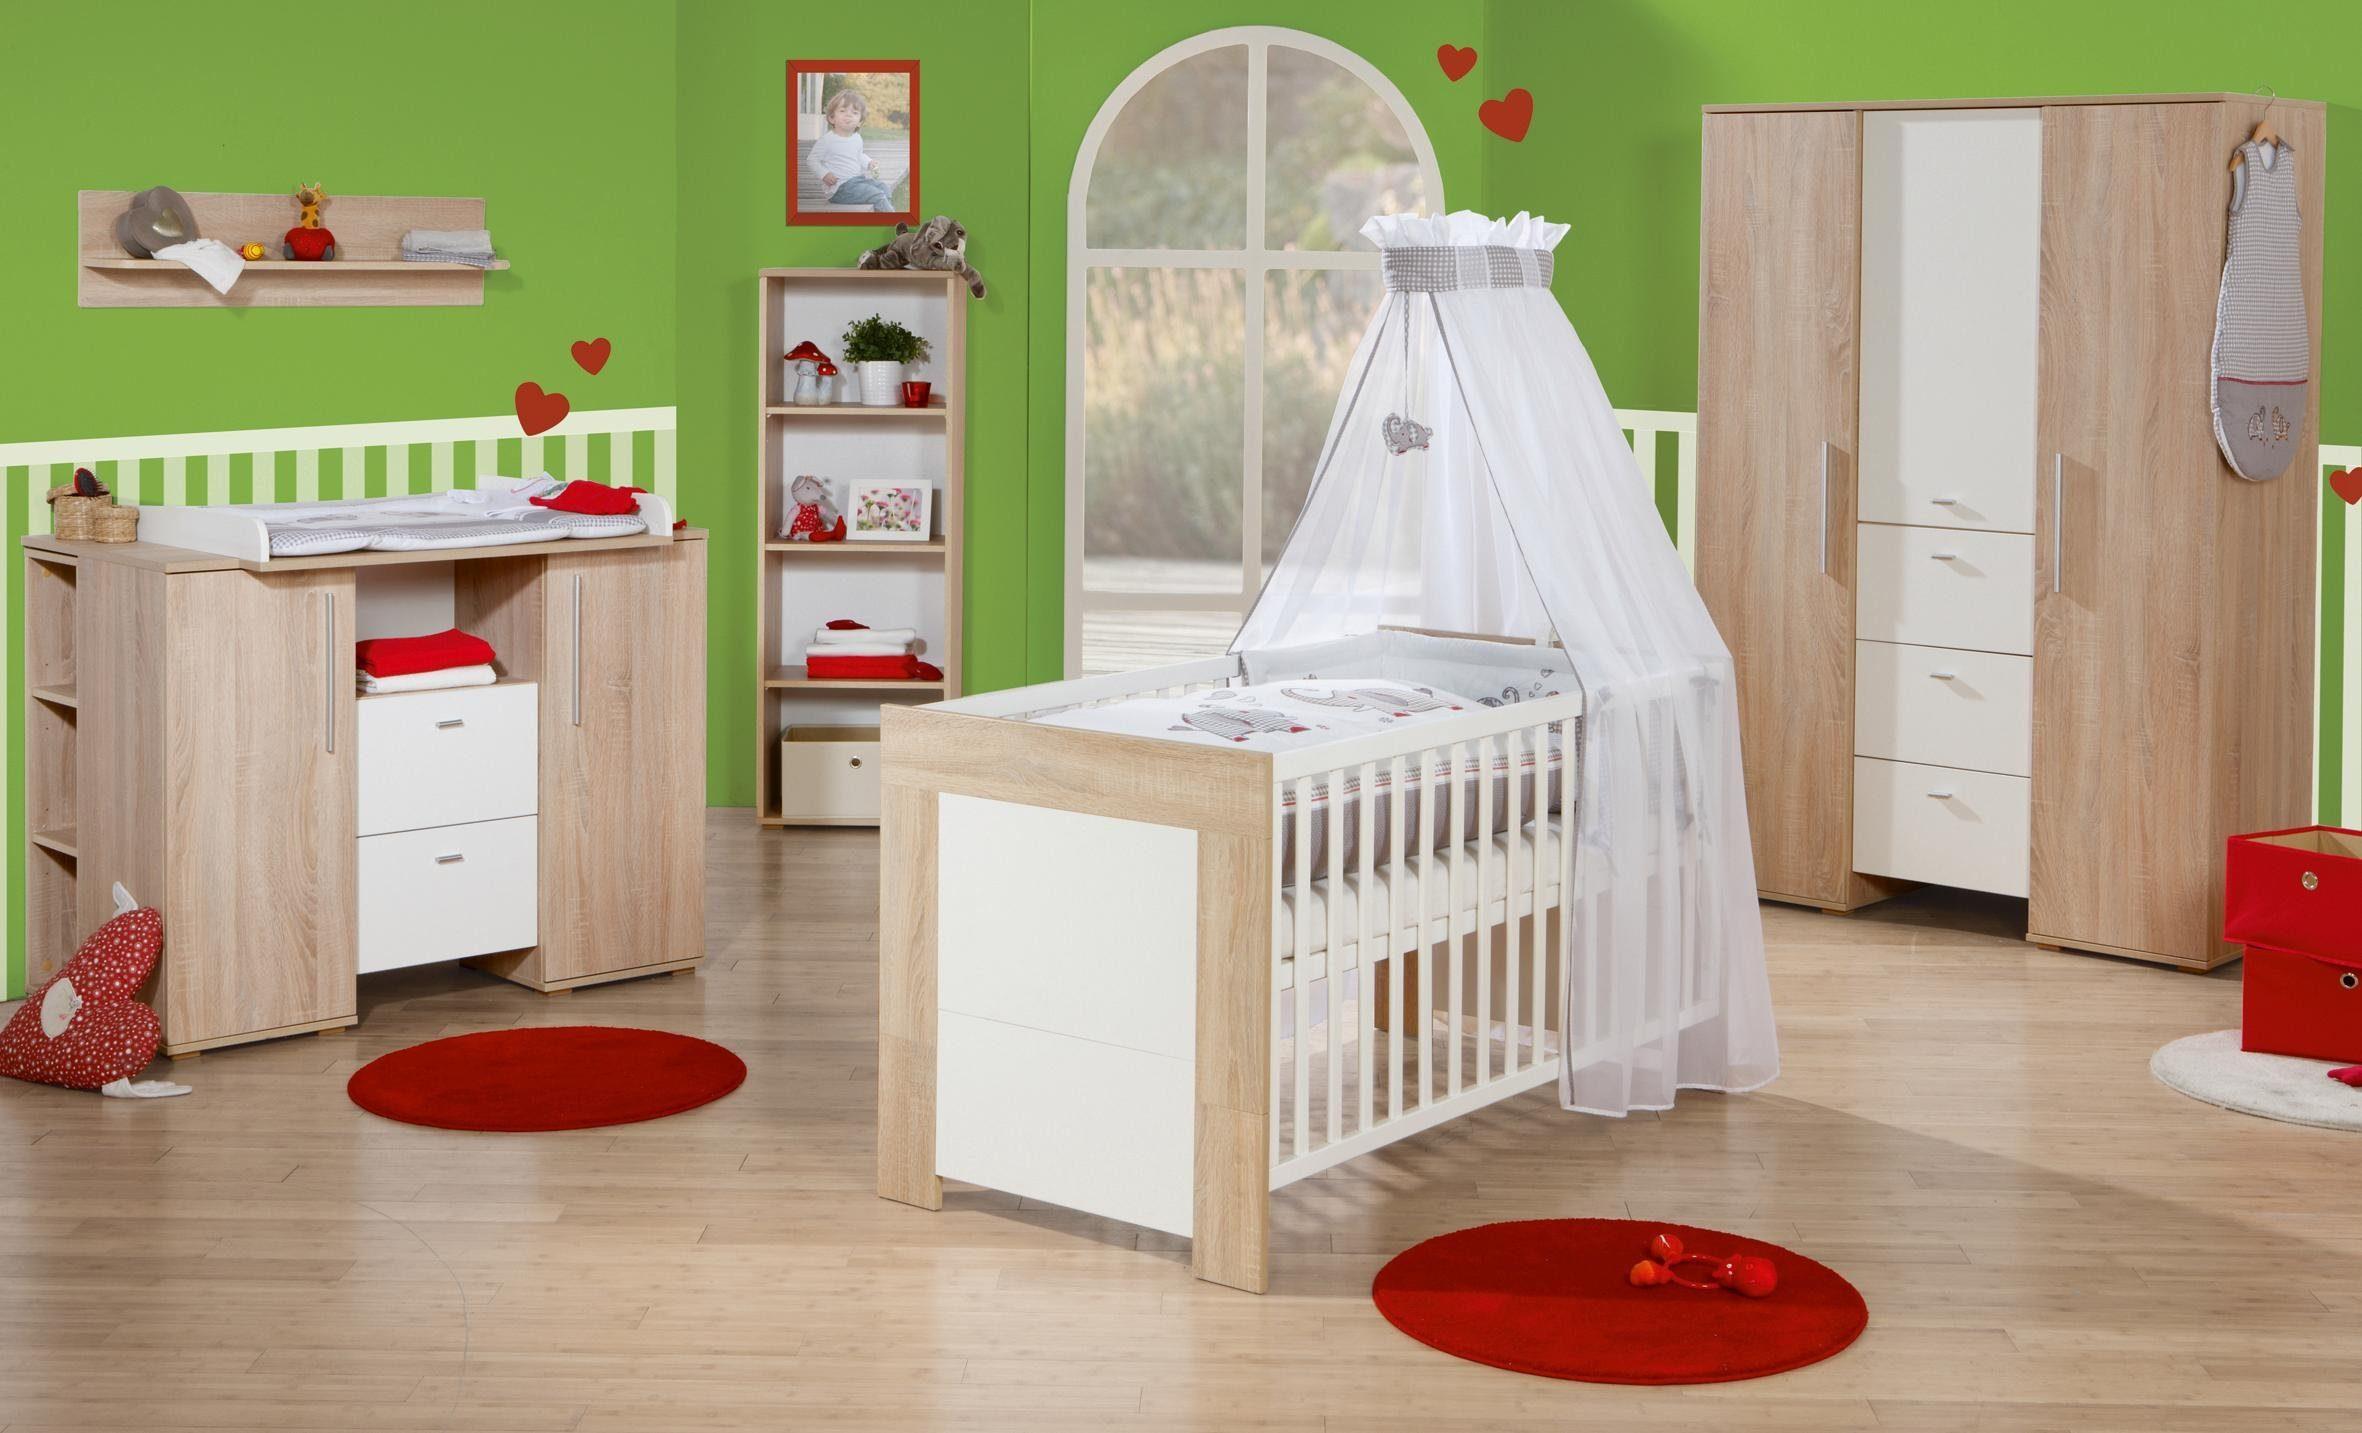 Roba Babyzimmer Set (3-tlg) Kinderzimmer »Daniel« S